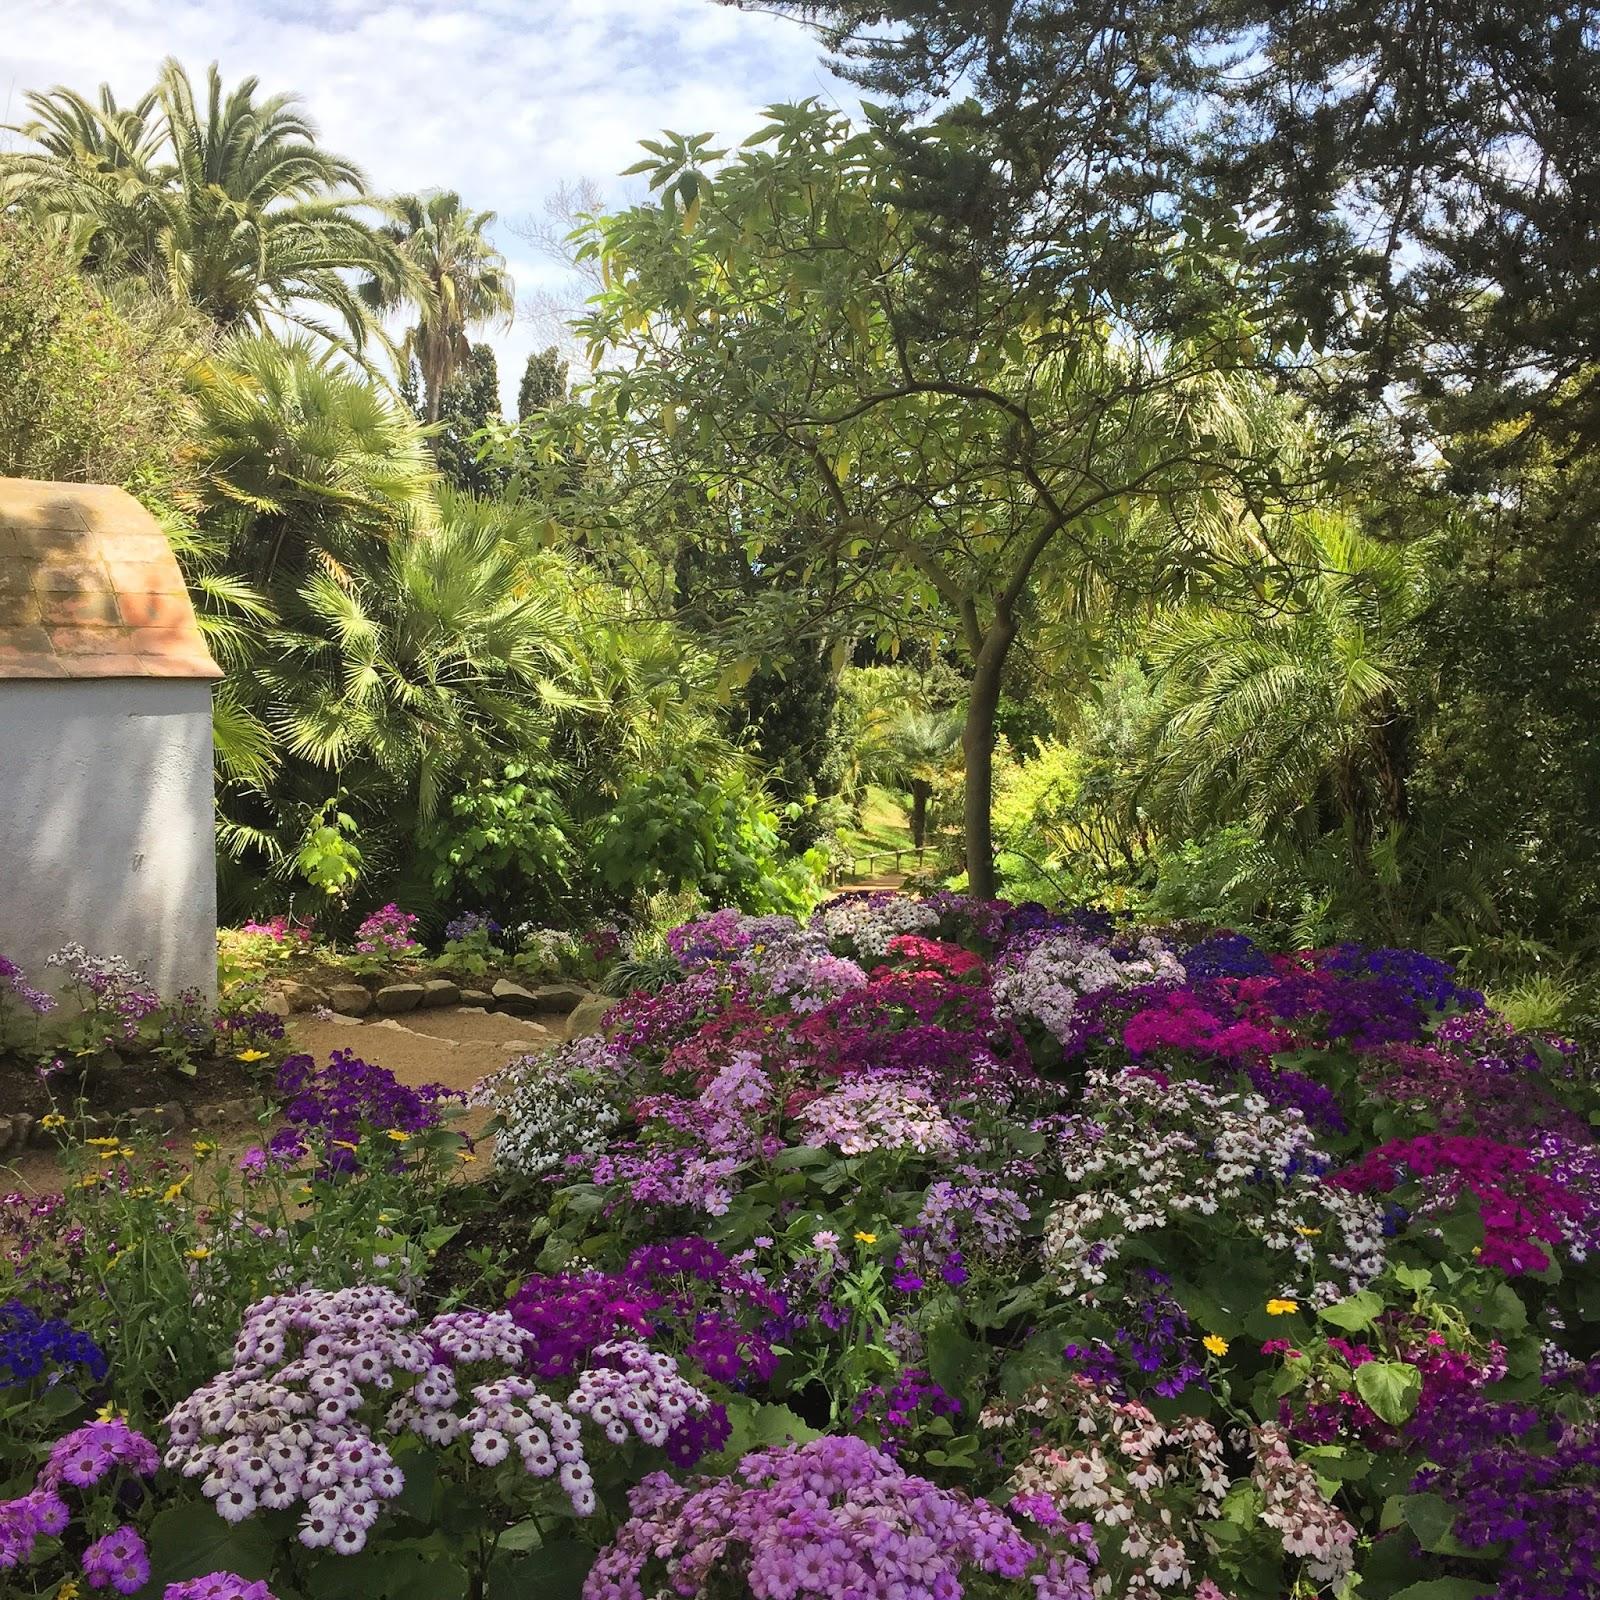 Gem 39 s country life visiting jardin botanico marimurta for Jardin spanish